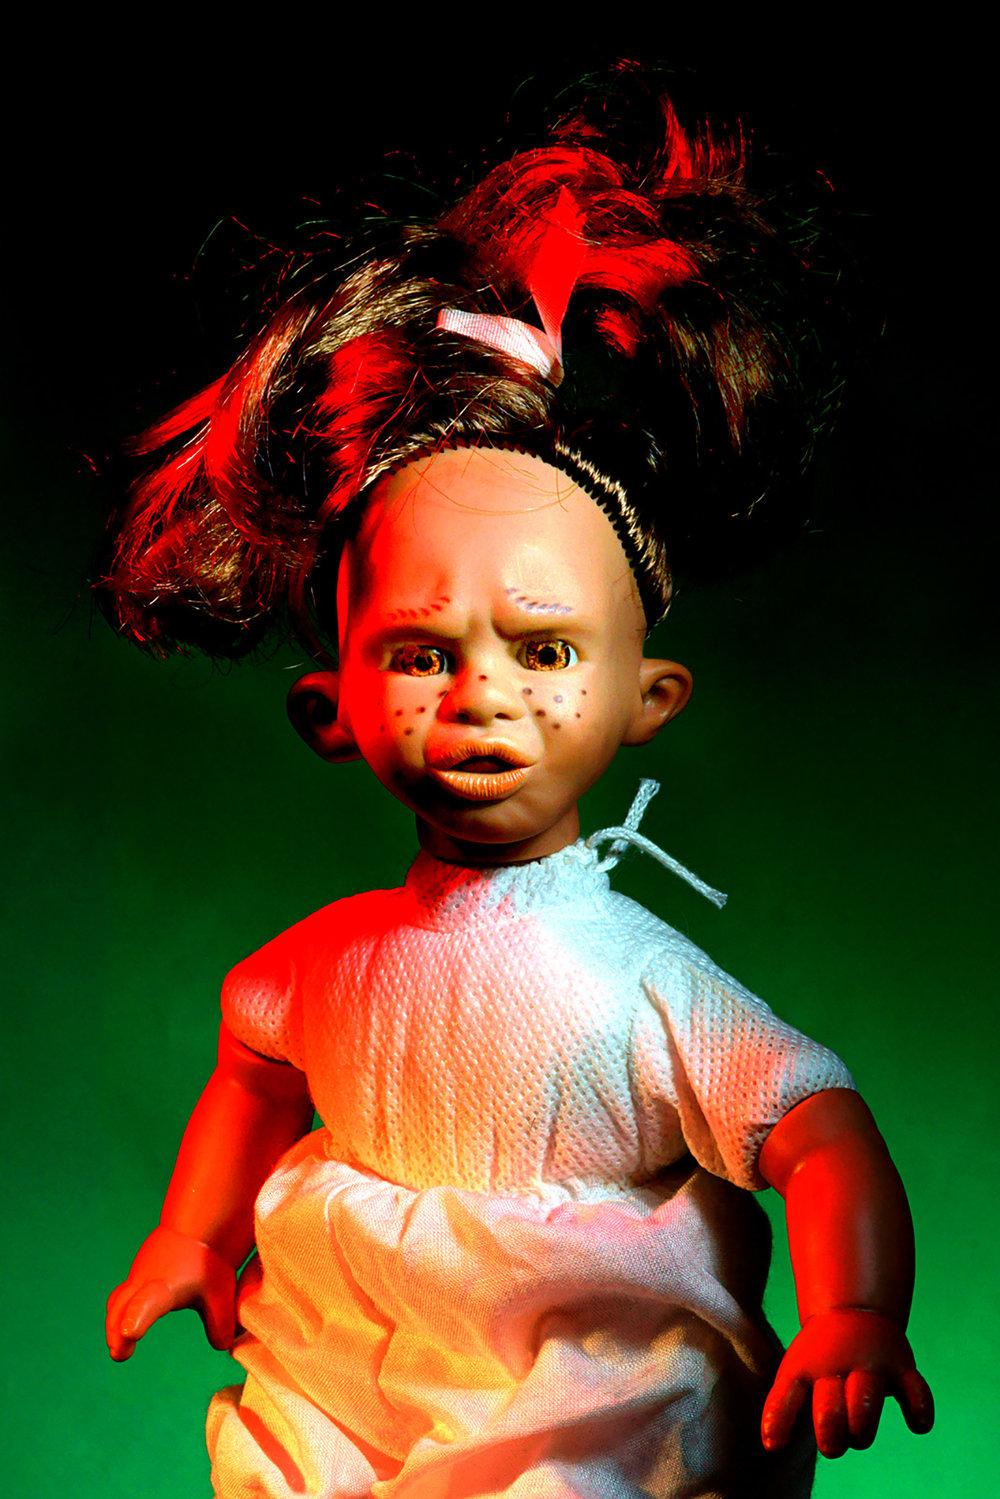 Kevin Mallett - doll with attitude